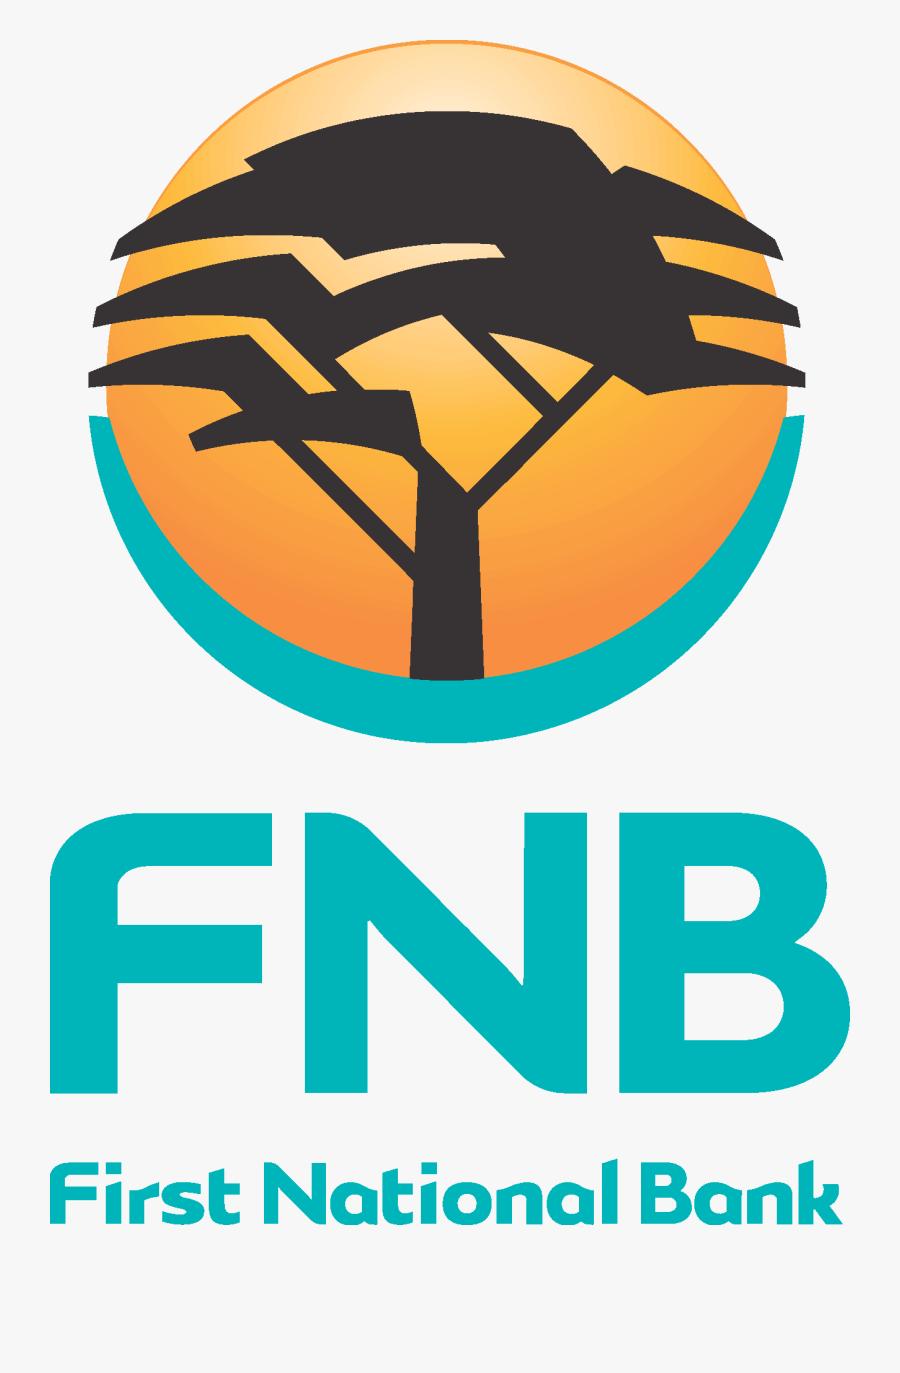 Fnb Bank [first National Bank] Png - First National Bank Ghana, Transparent Clipart